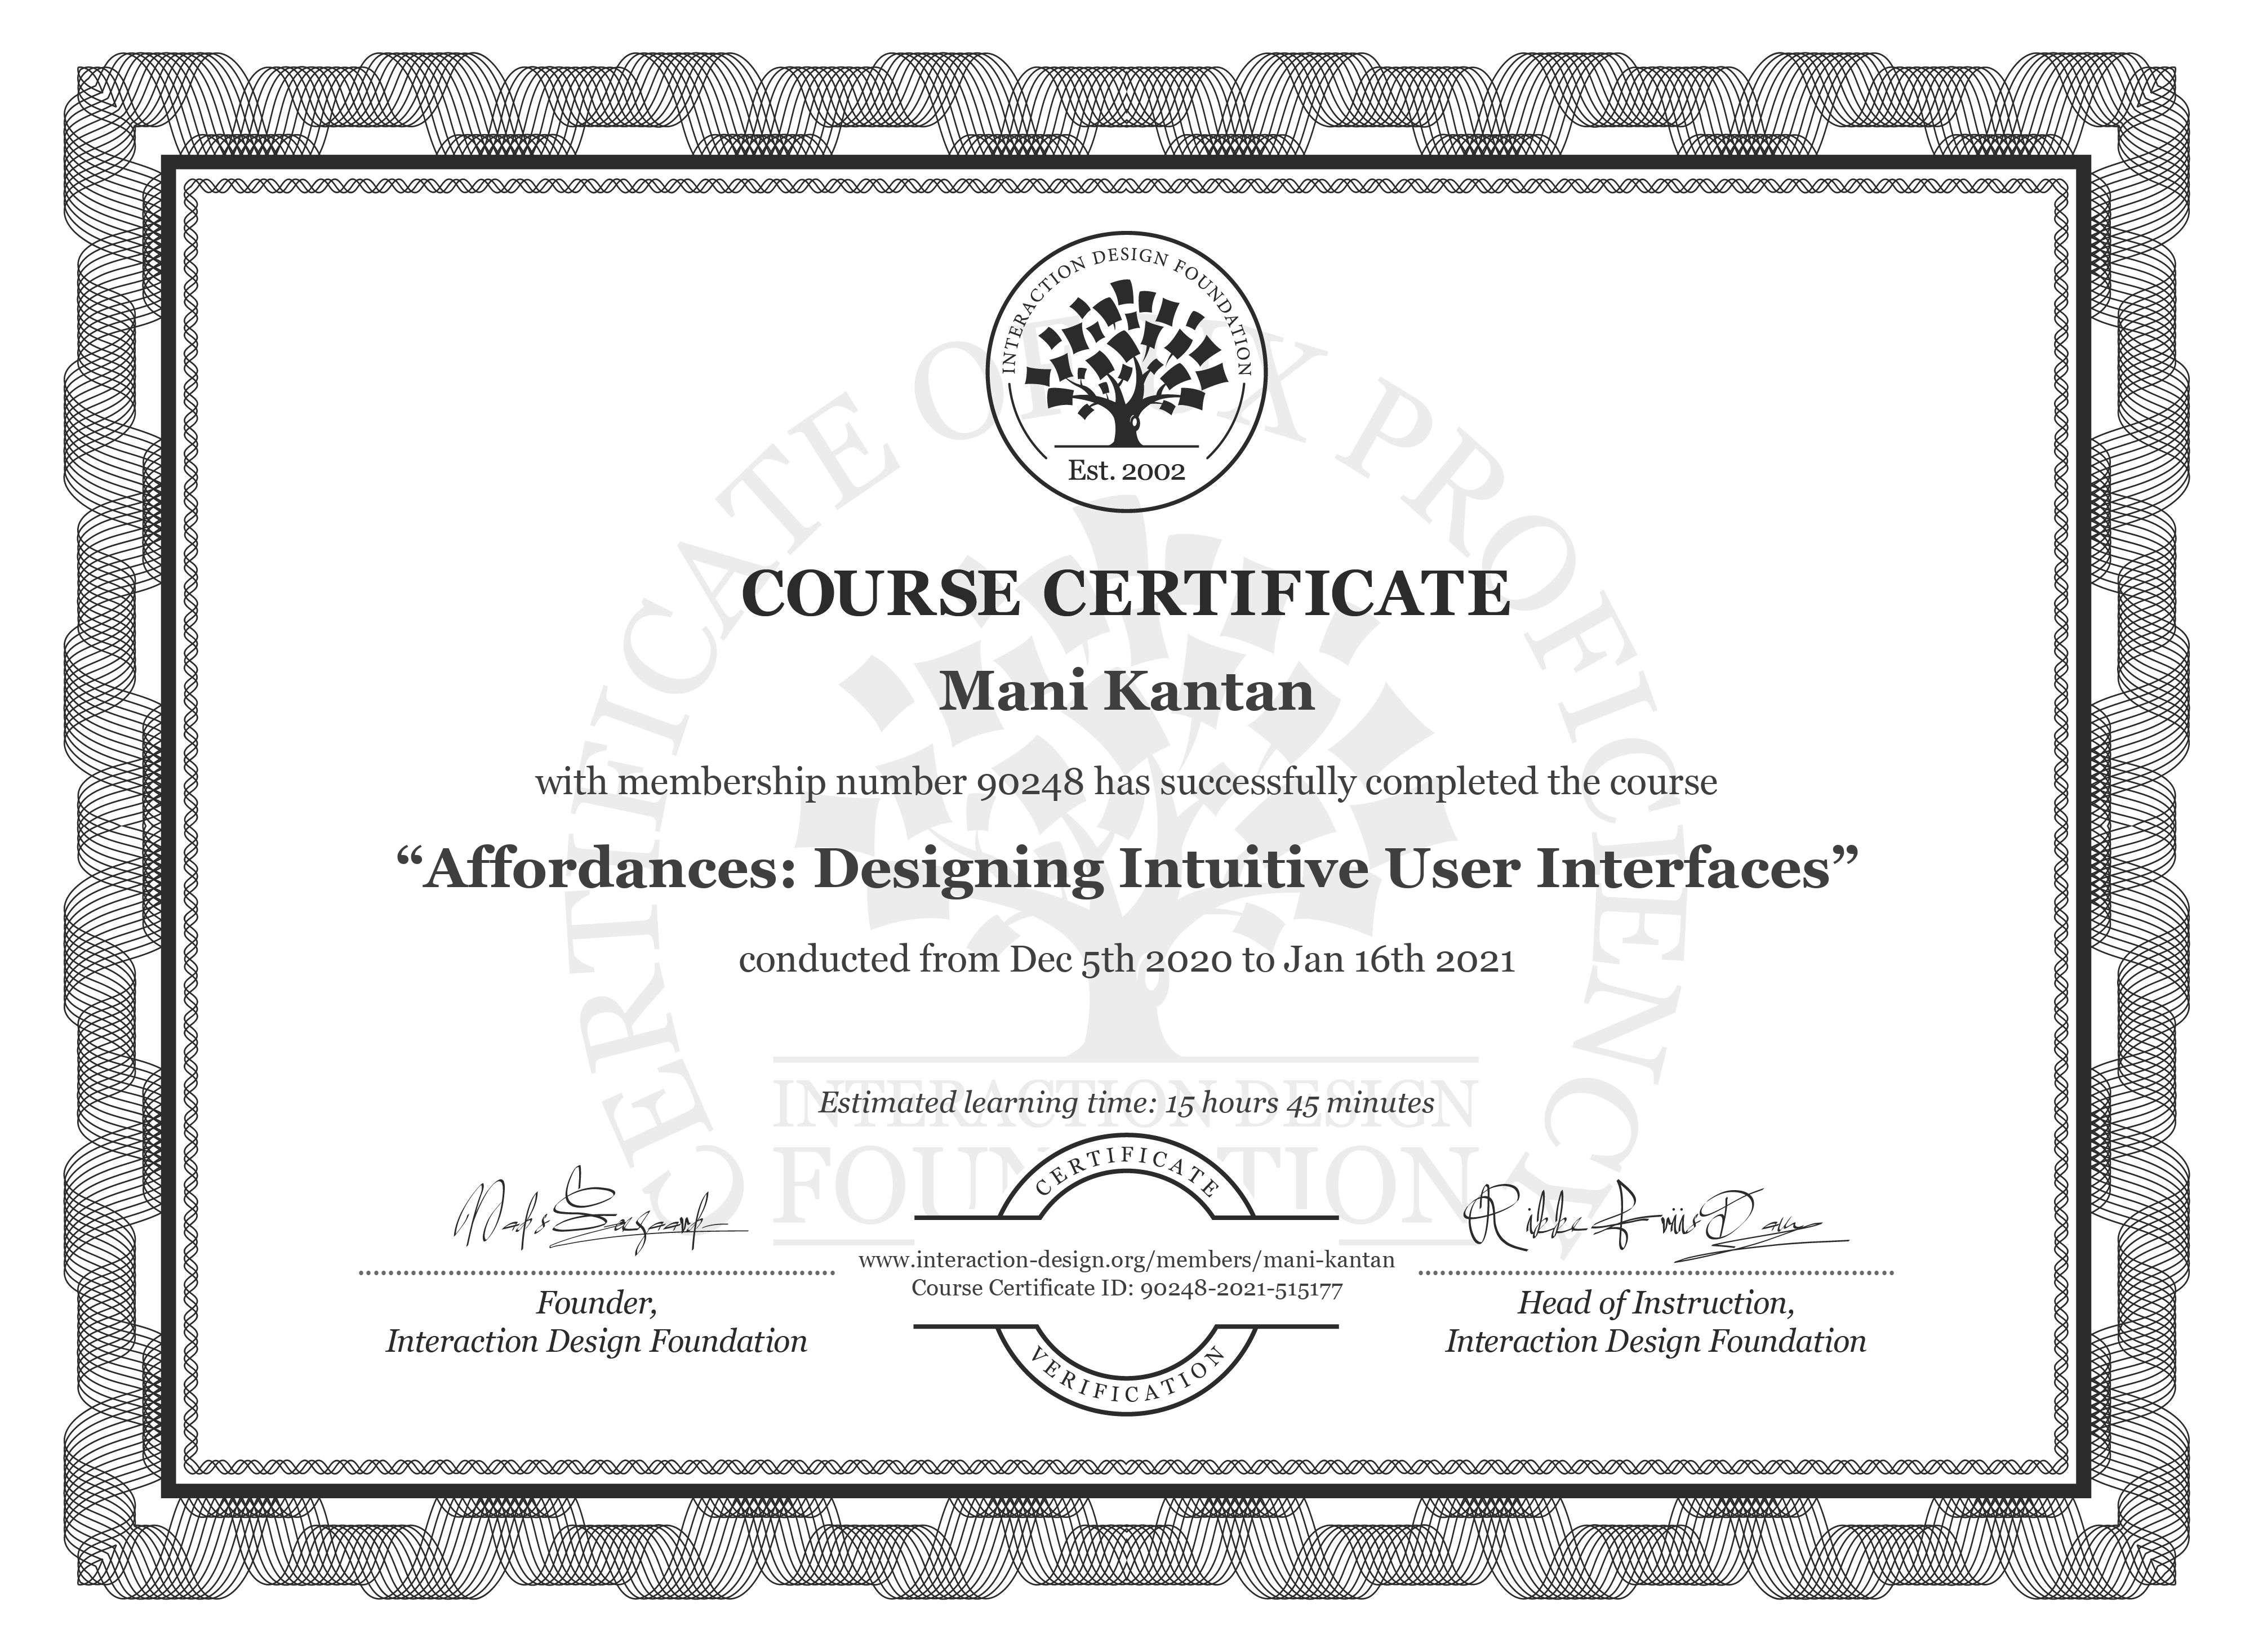 Mani Kantan's Course Certificate: Affordances: Designing Intuitive User Interfaces